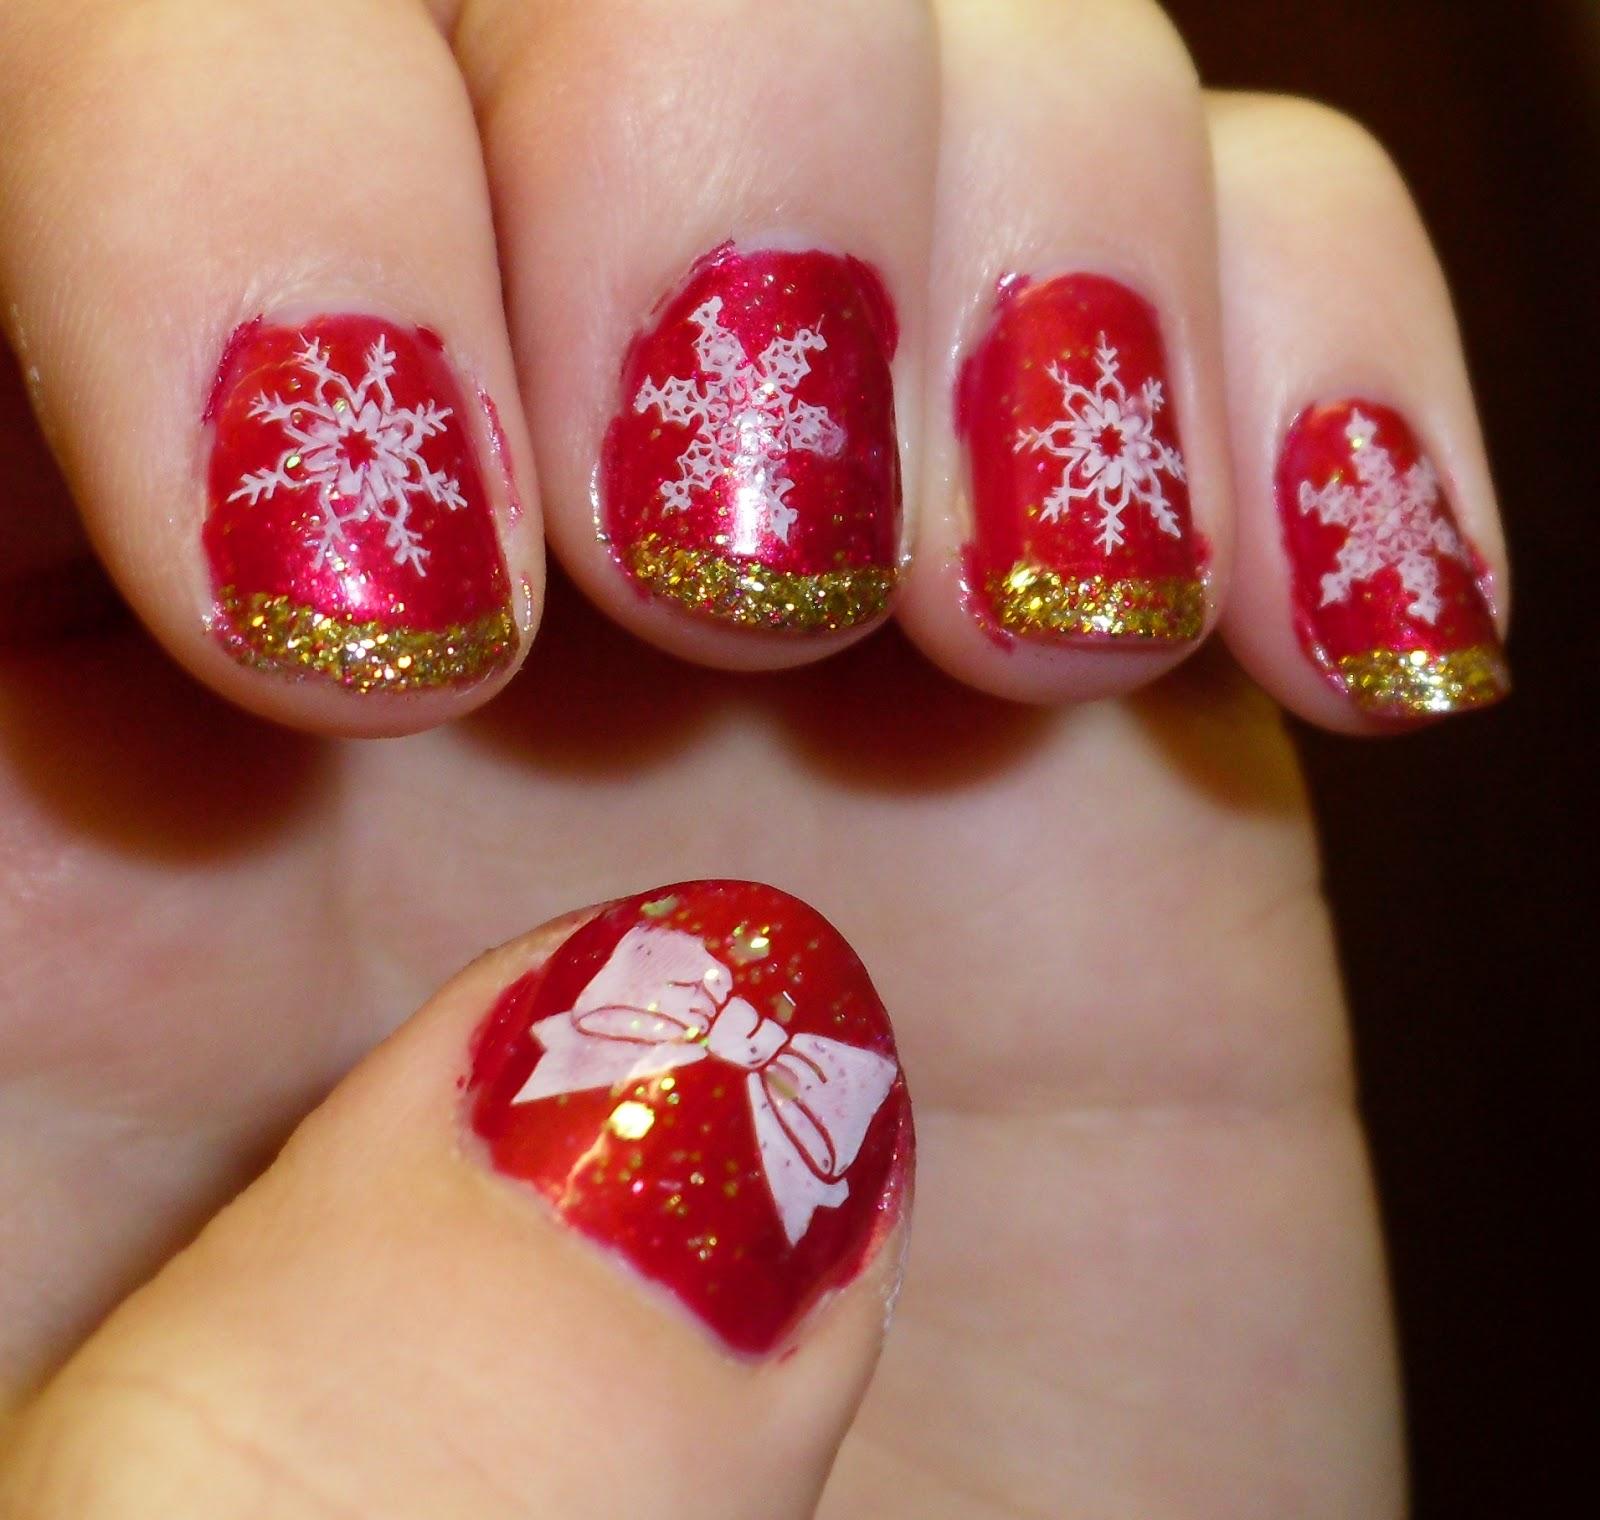 Lindchens World: [Nageldesign] Snow on Christmas